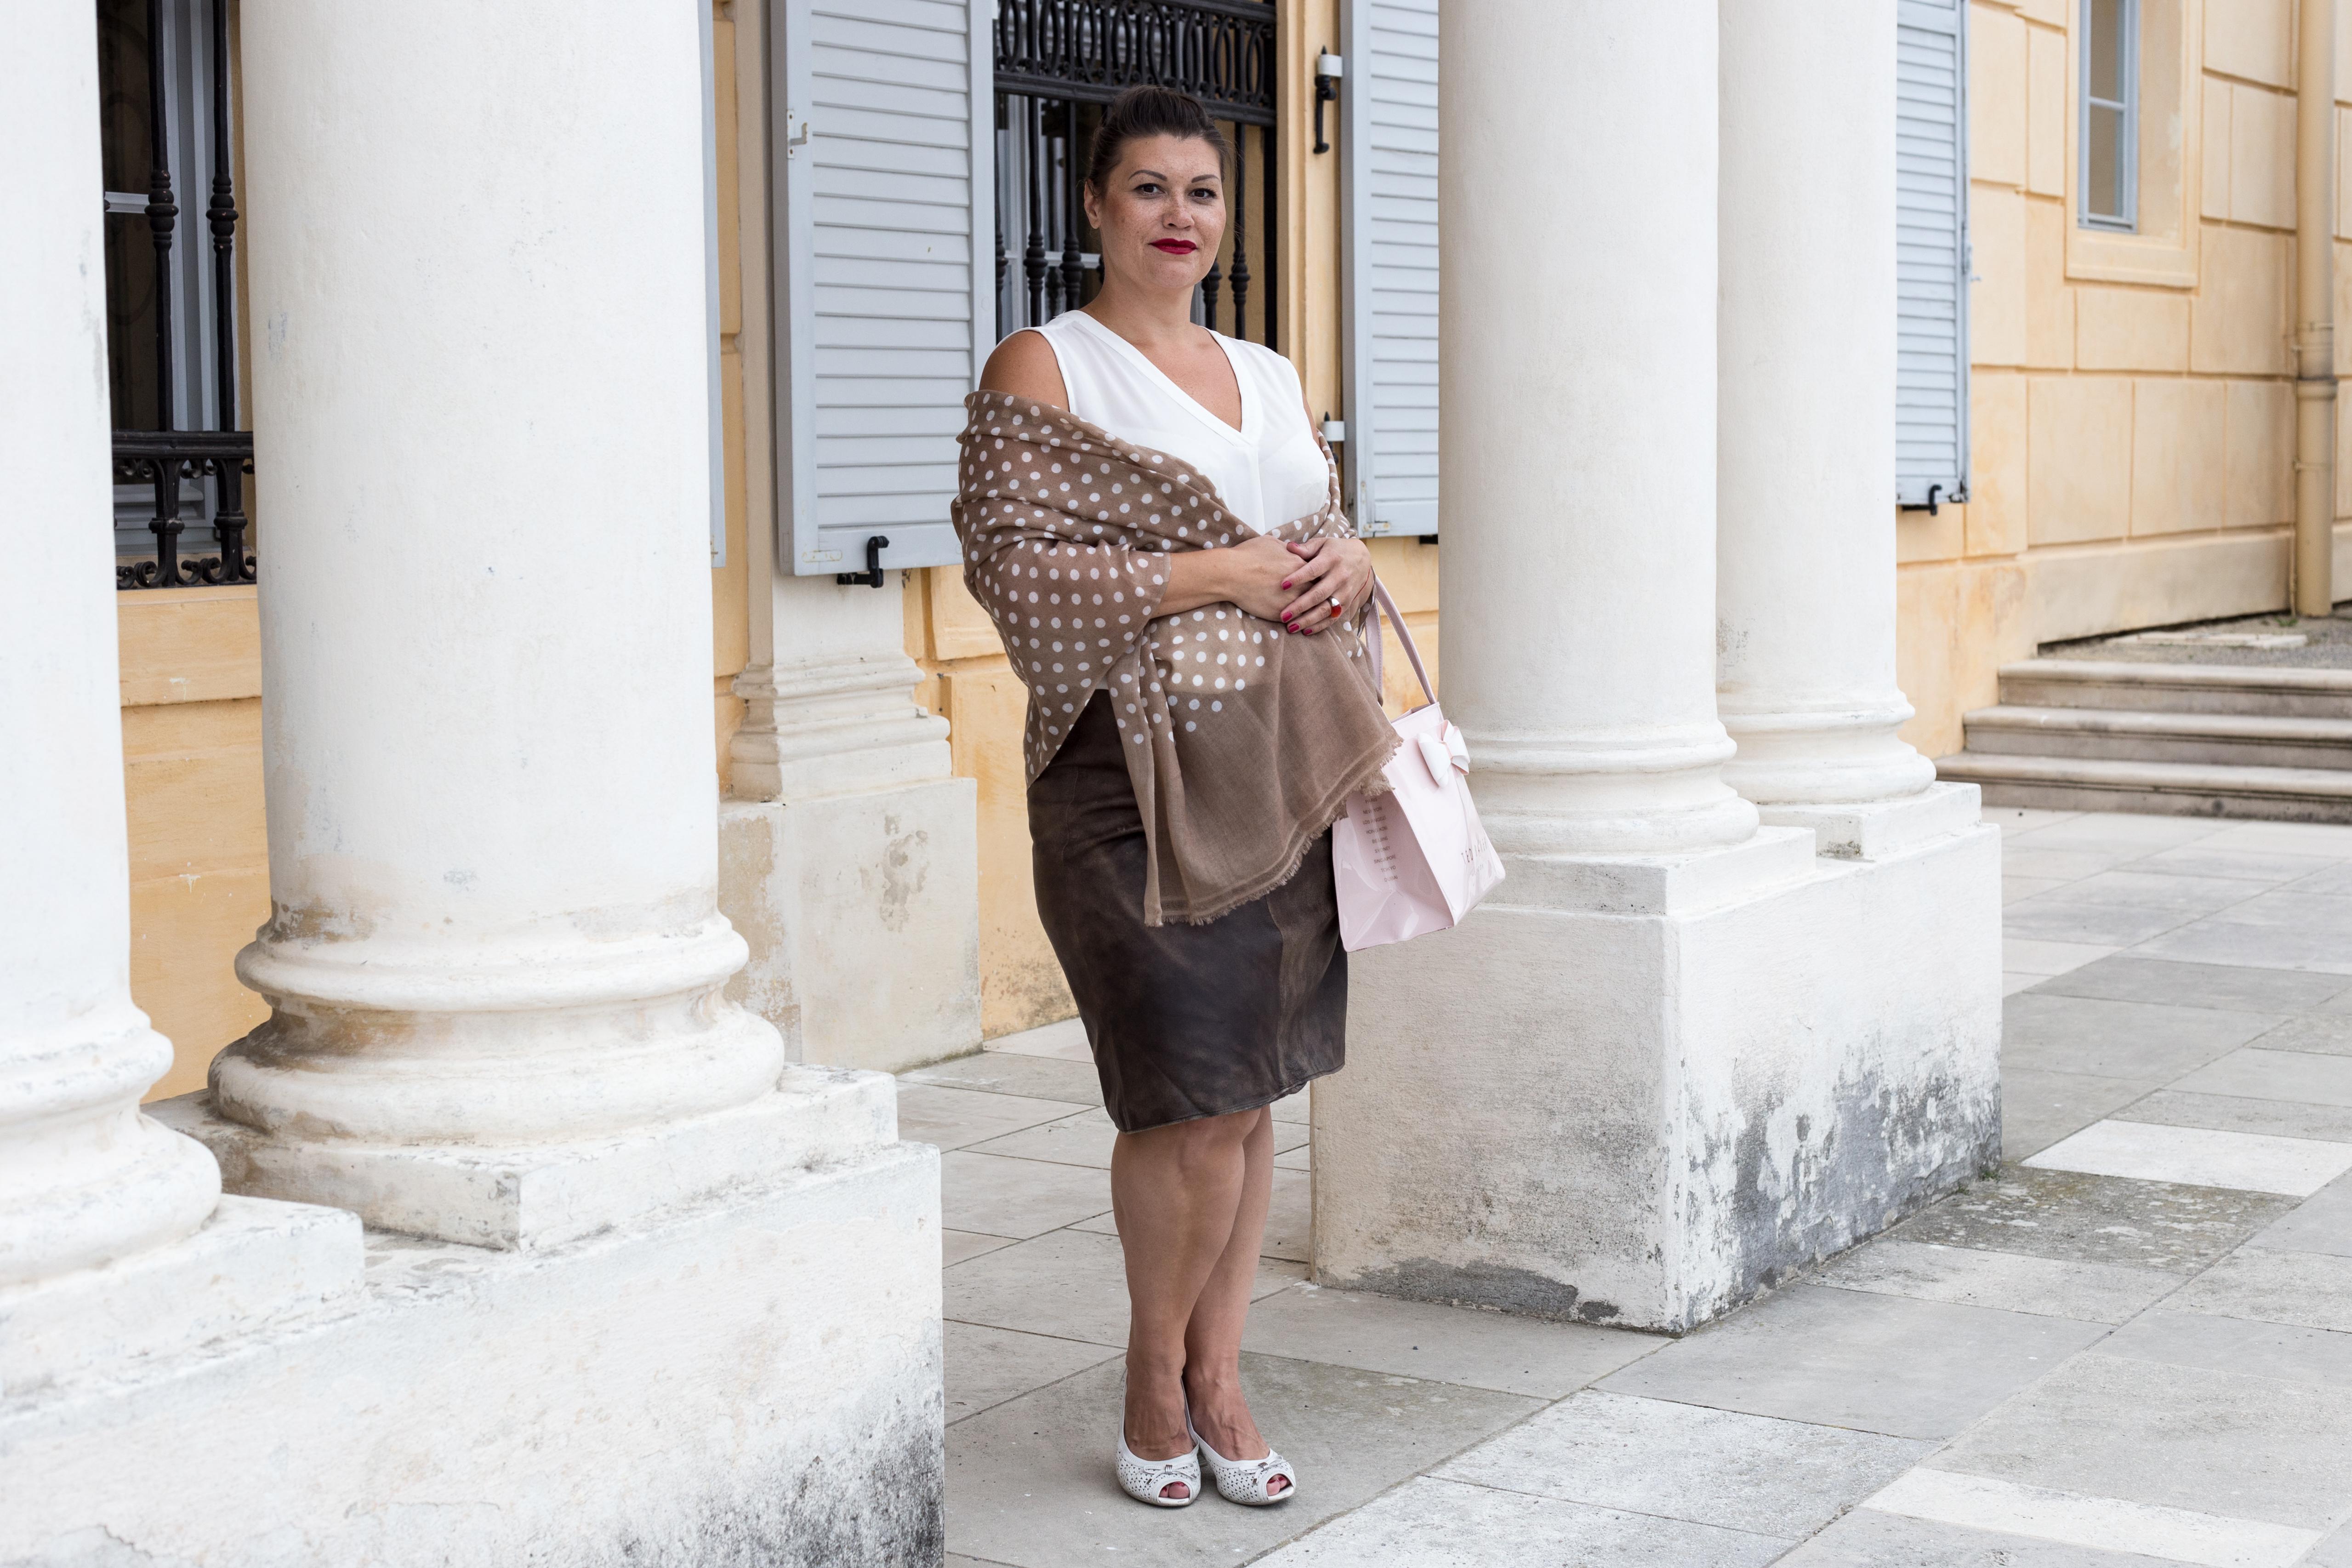 kardiaserena vintage look leder skirt dots scarf maheela ted baker schloss hof peeptoes caprice igersaustria